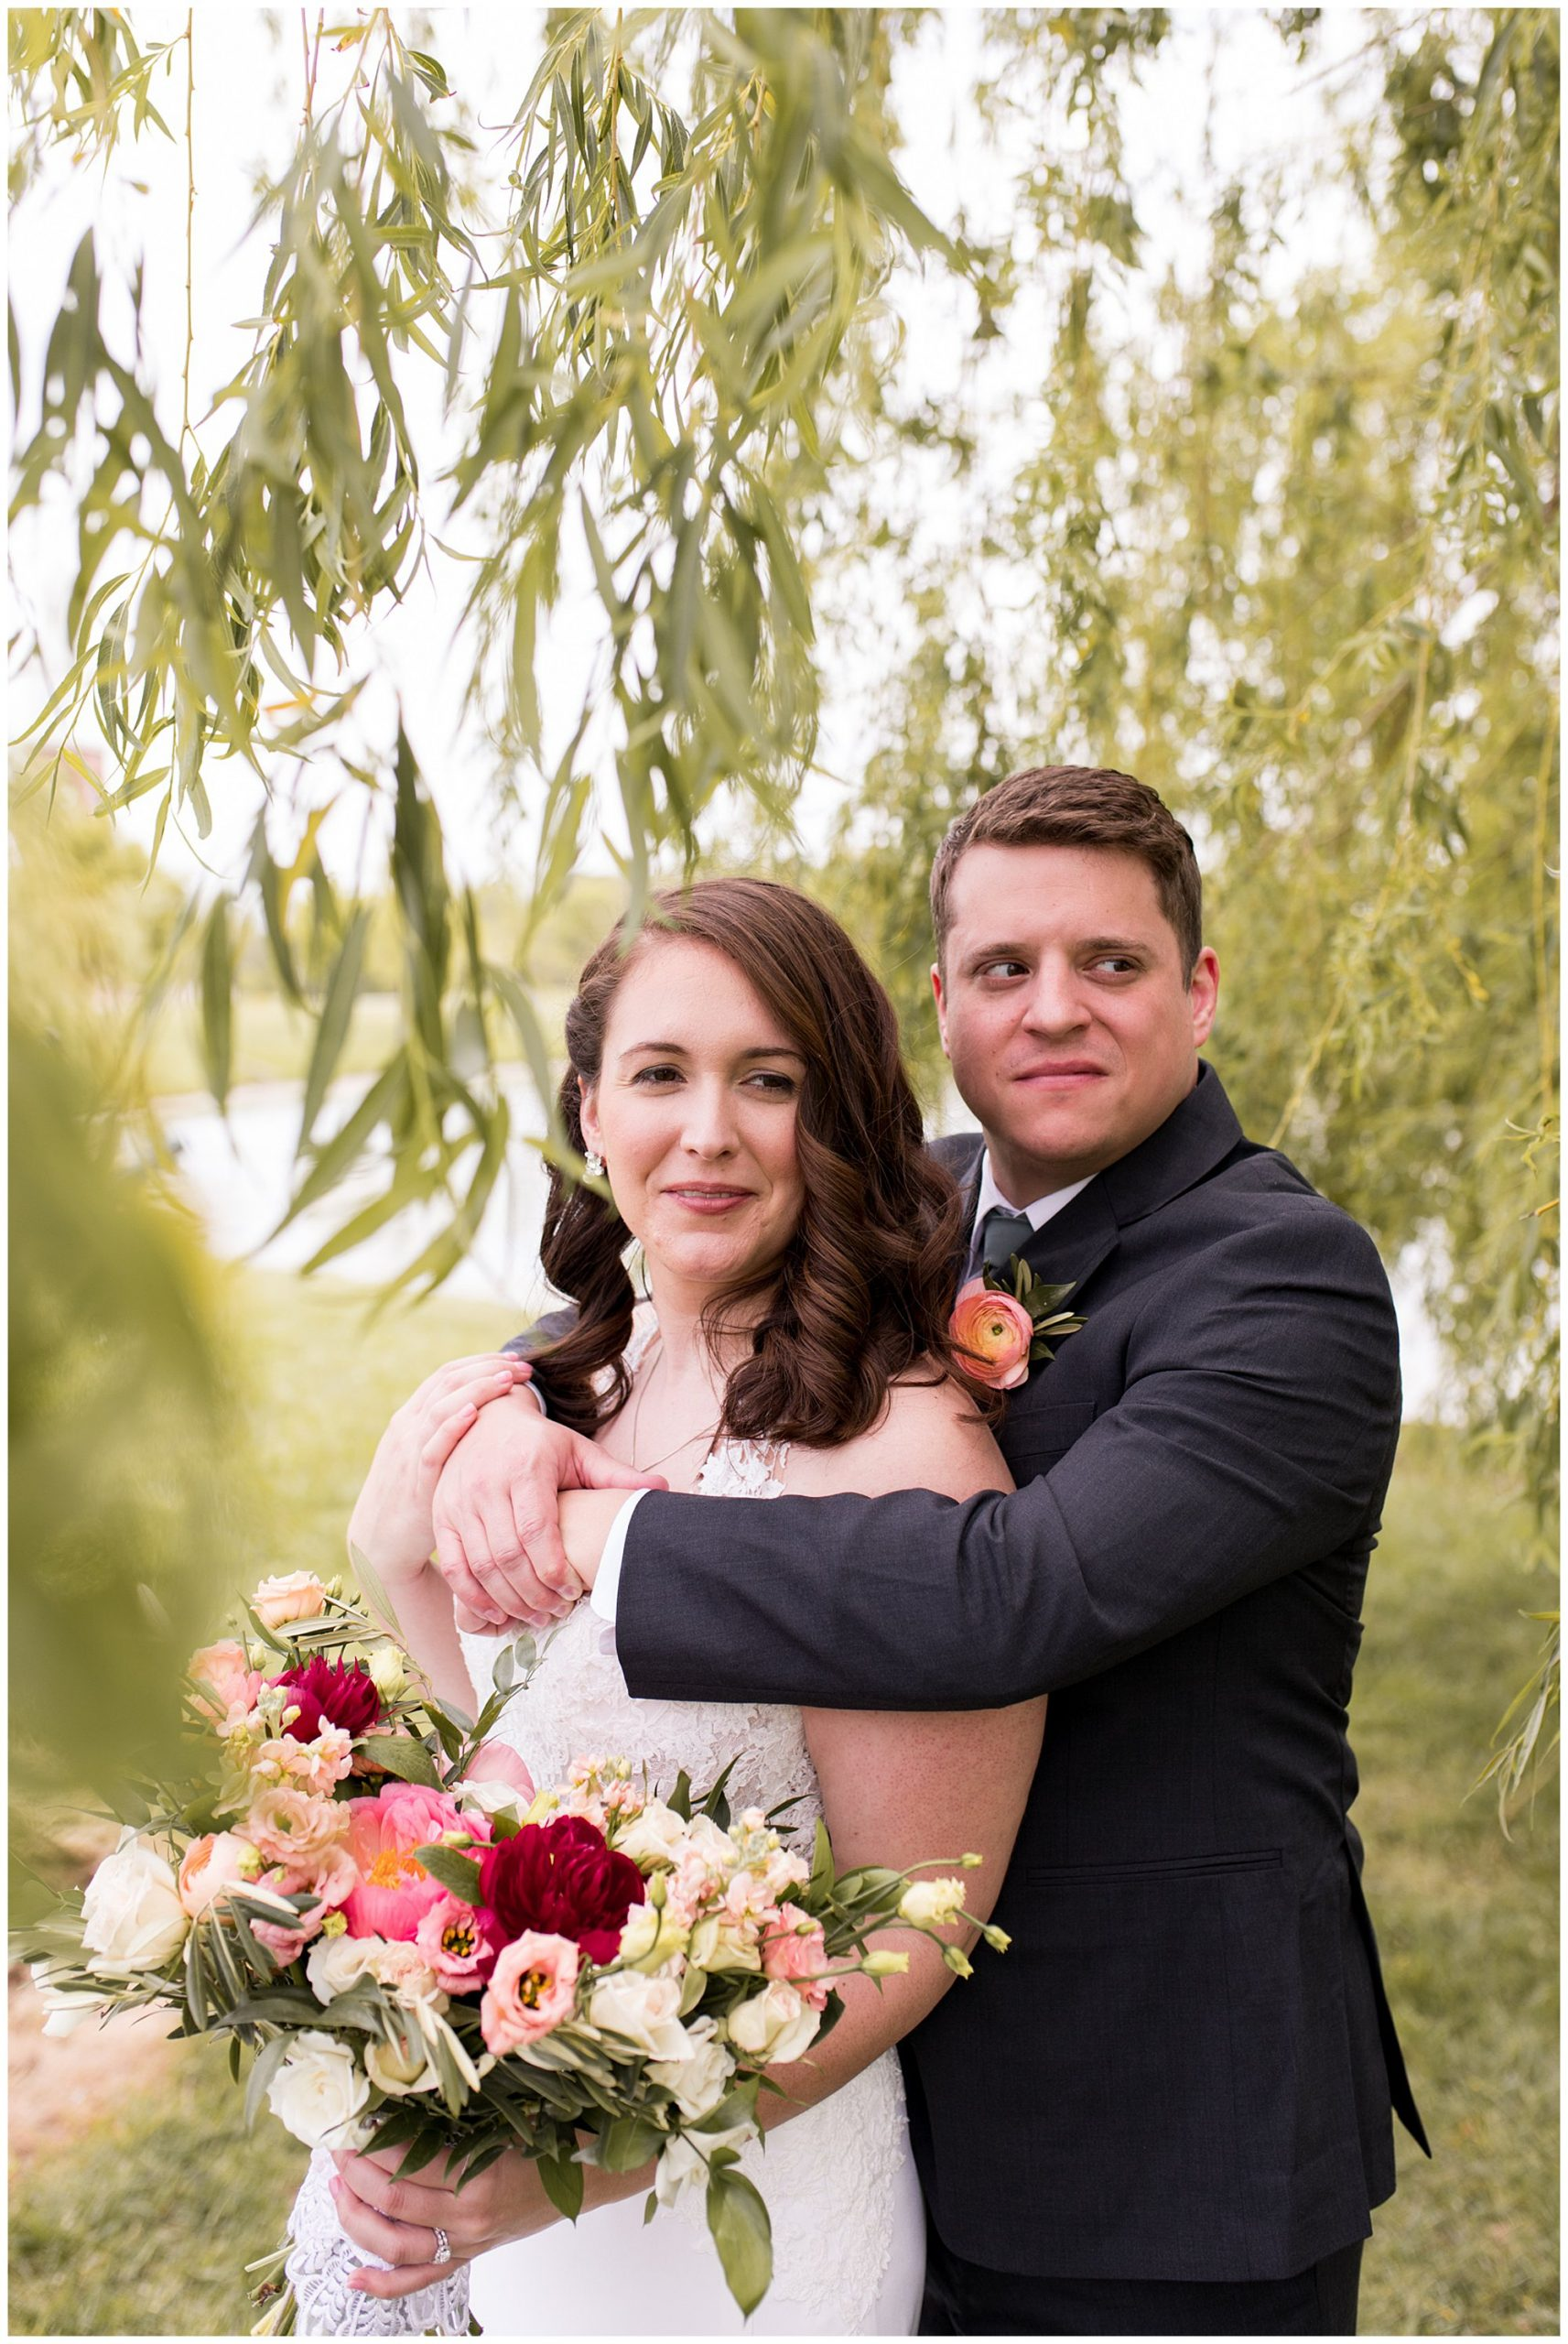 Coxhall Gardens bride and groom wedding photos